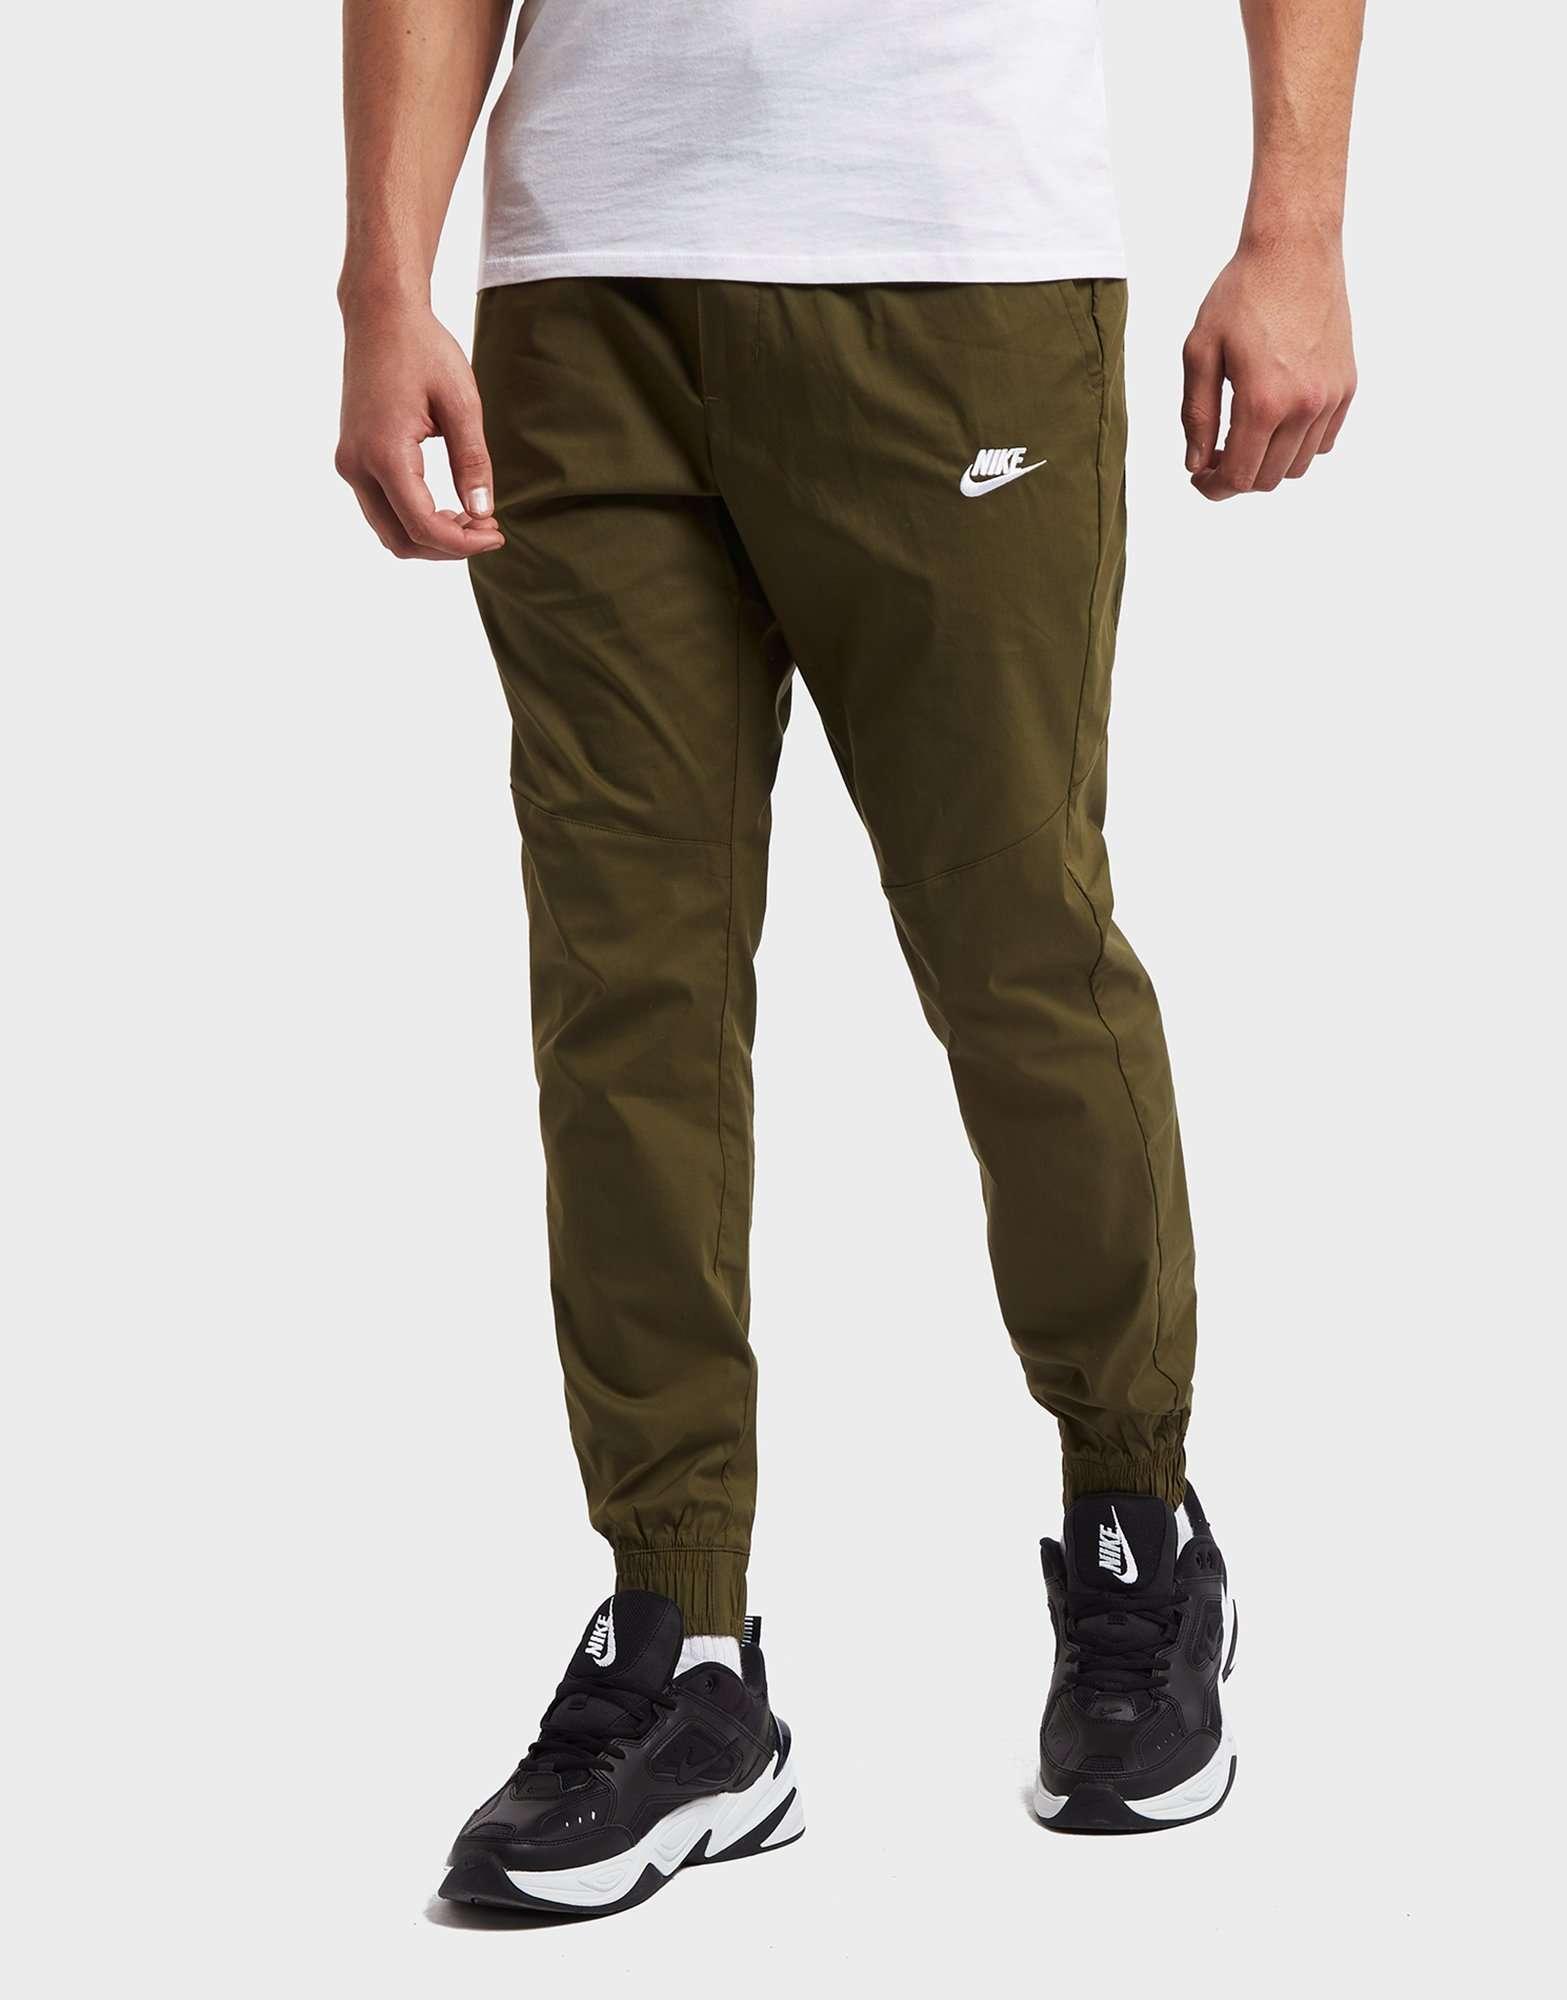 adidas Originals California Cuff Track Pants Manufacturer